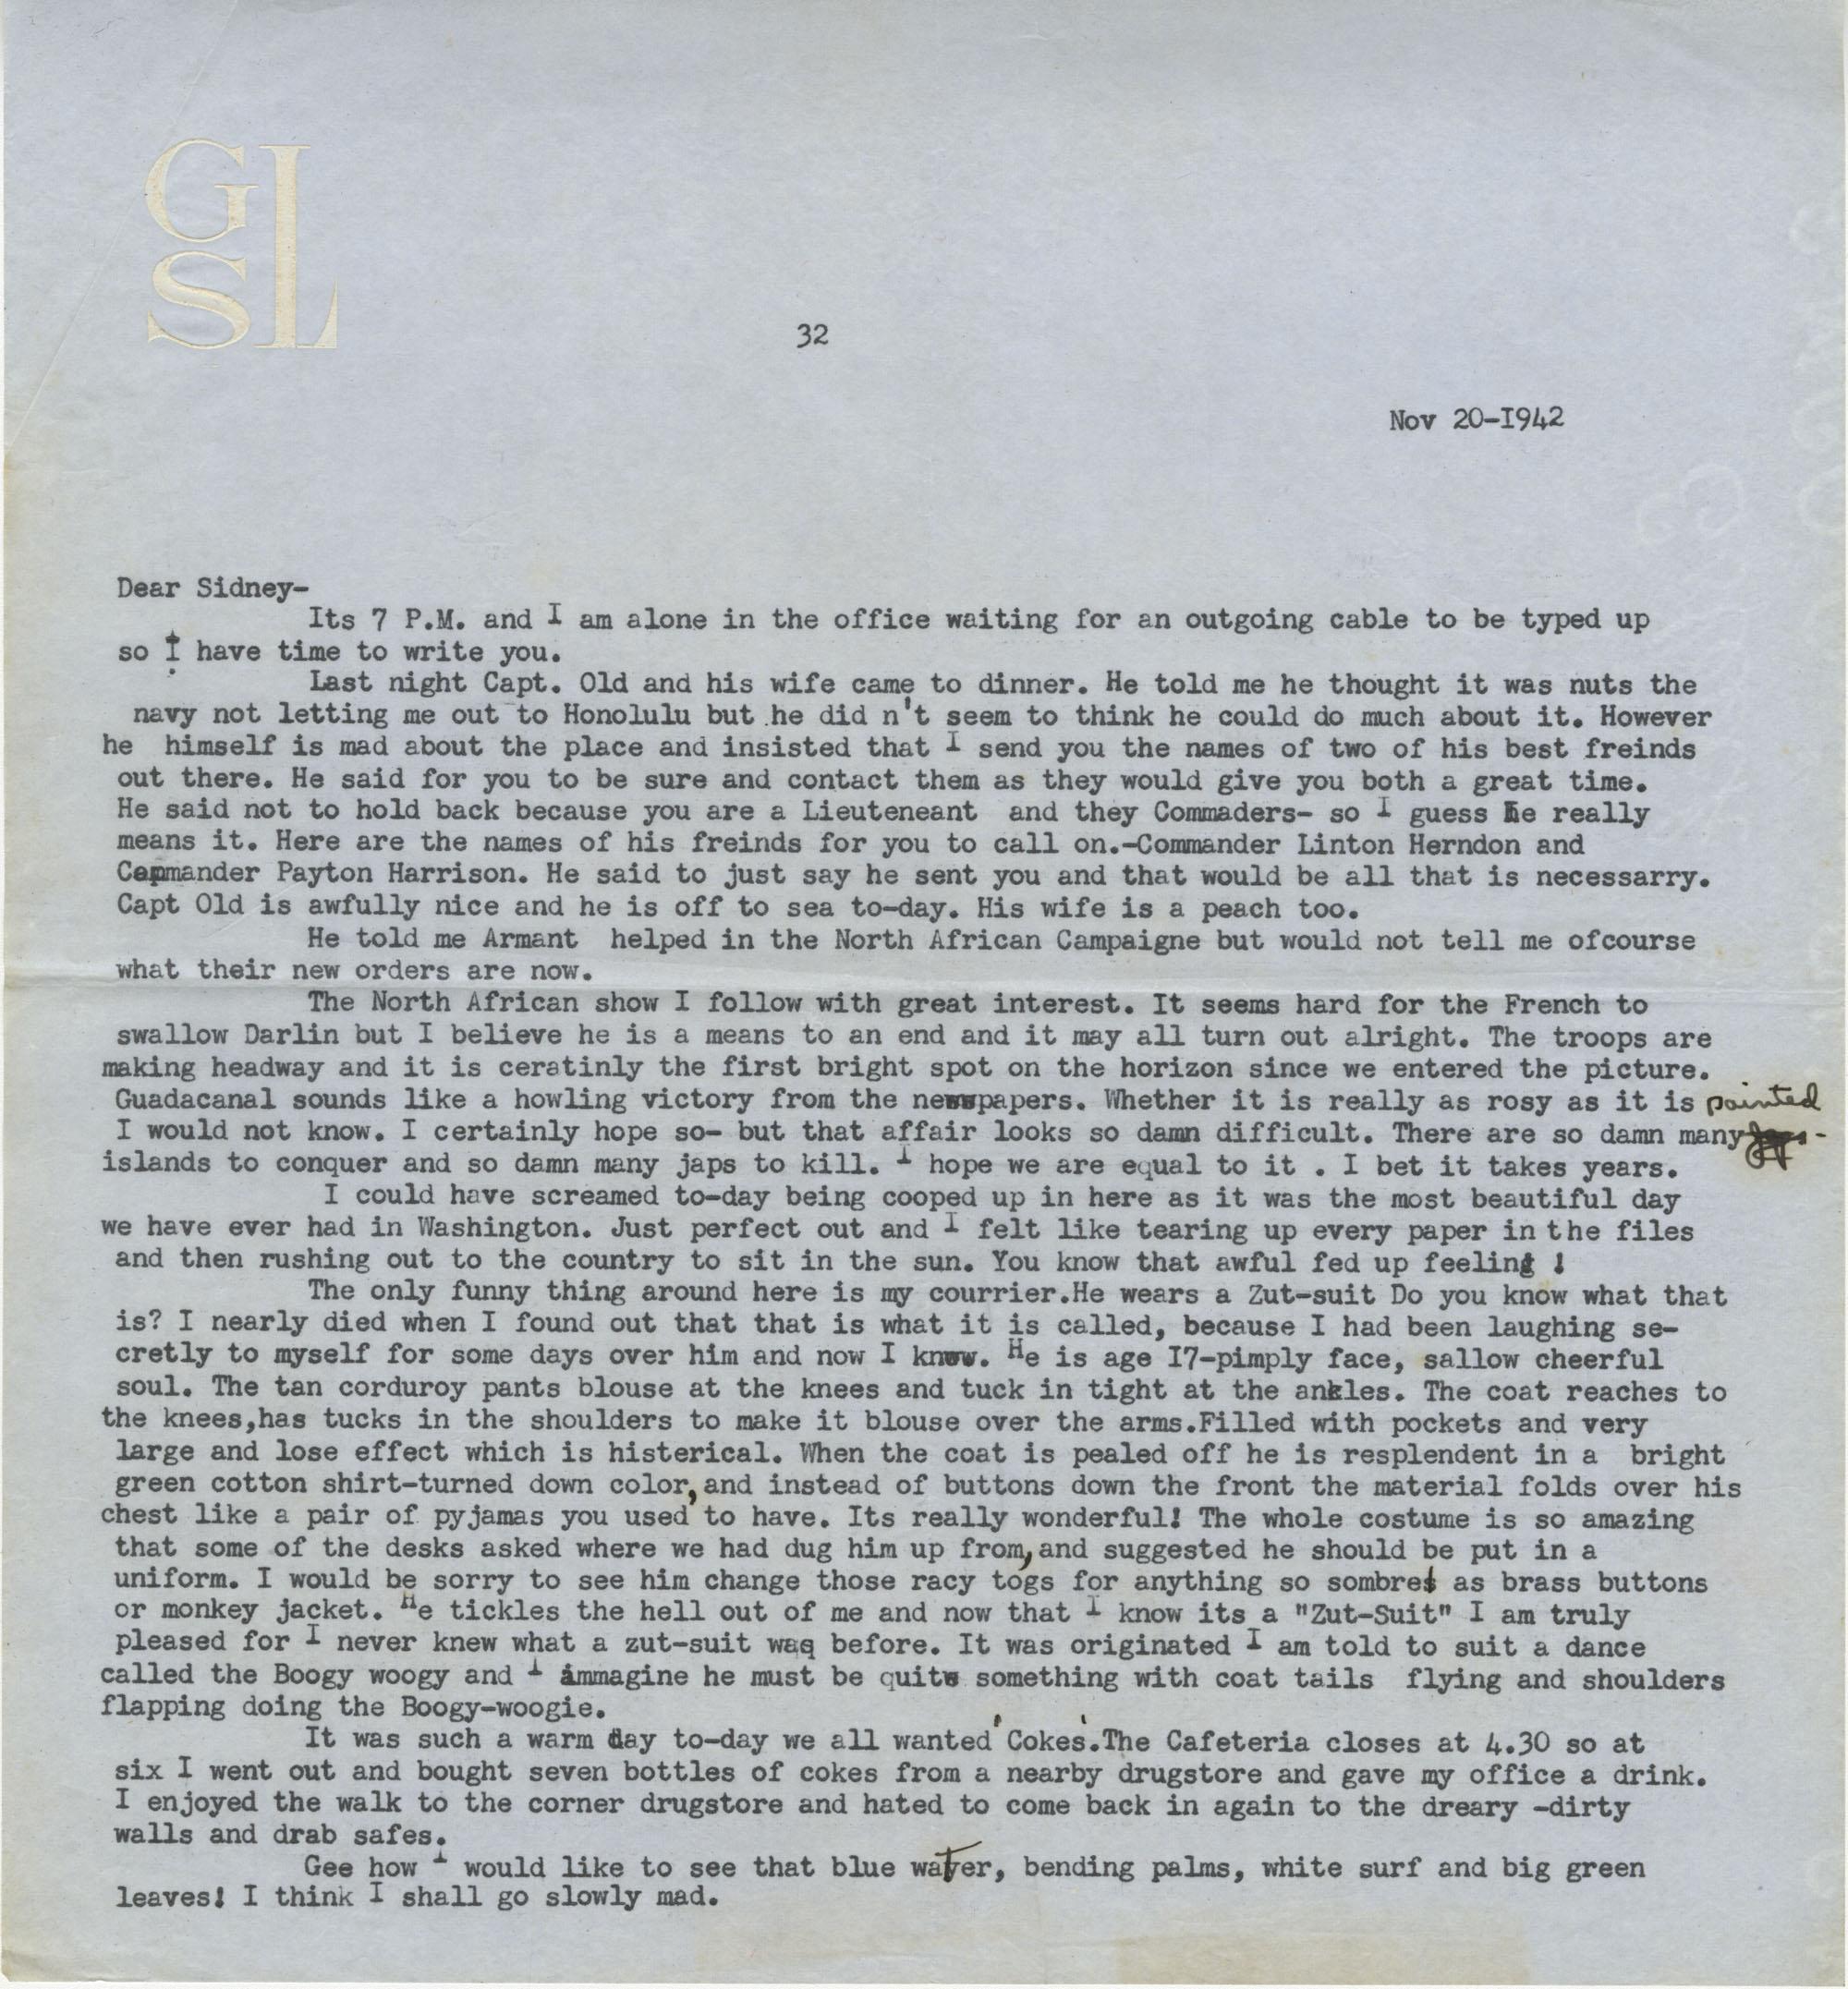 Letter from Gertrude Sanford Legendre, November 20, 1942